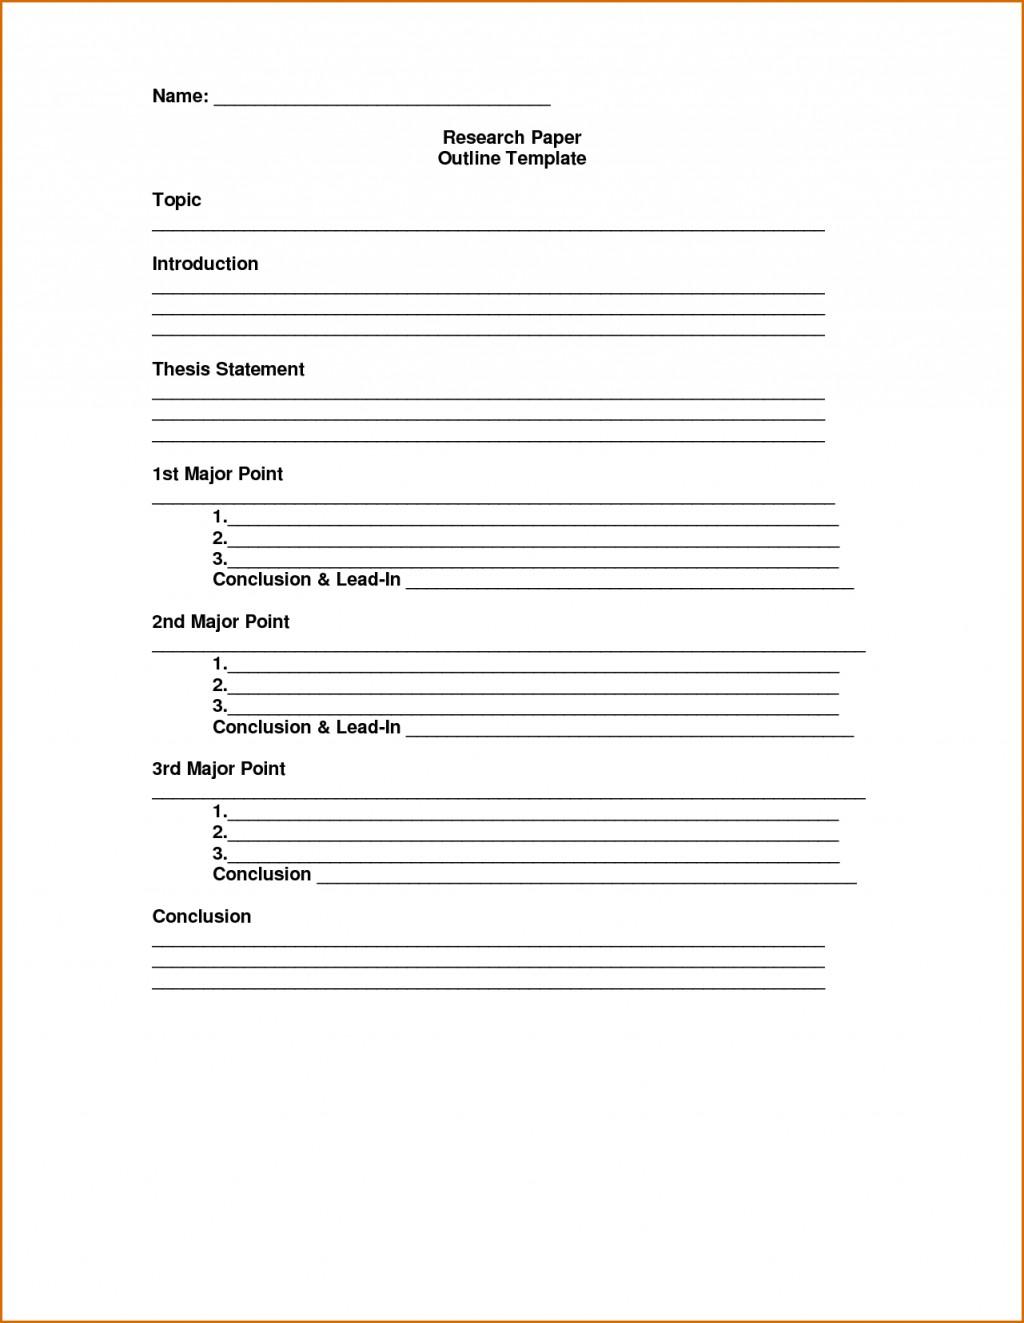 005 Essay Outline Template Excellent Mla Argumentative High School Research Paper Pdf Large